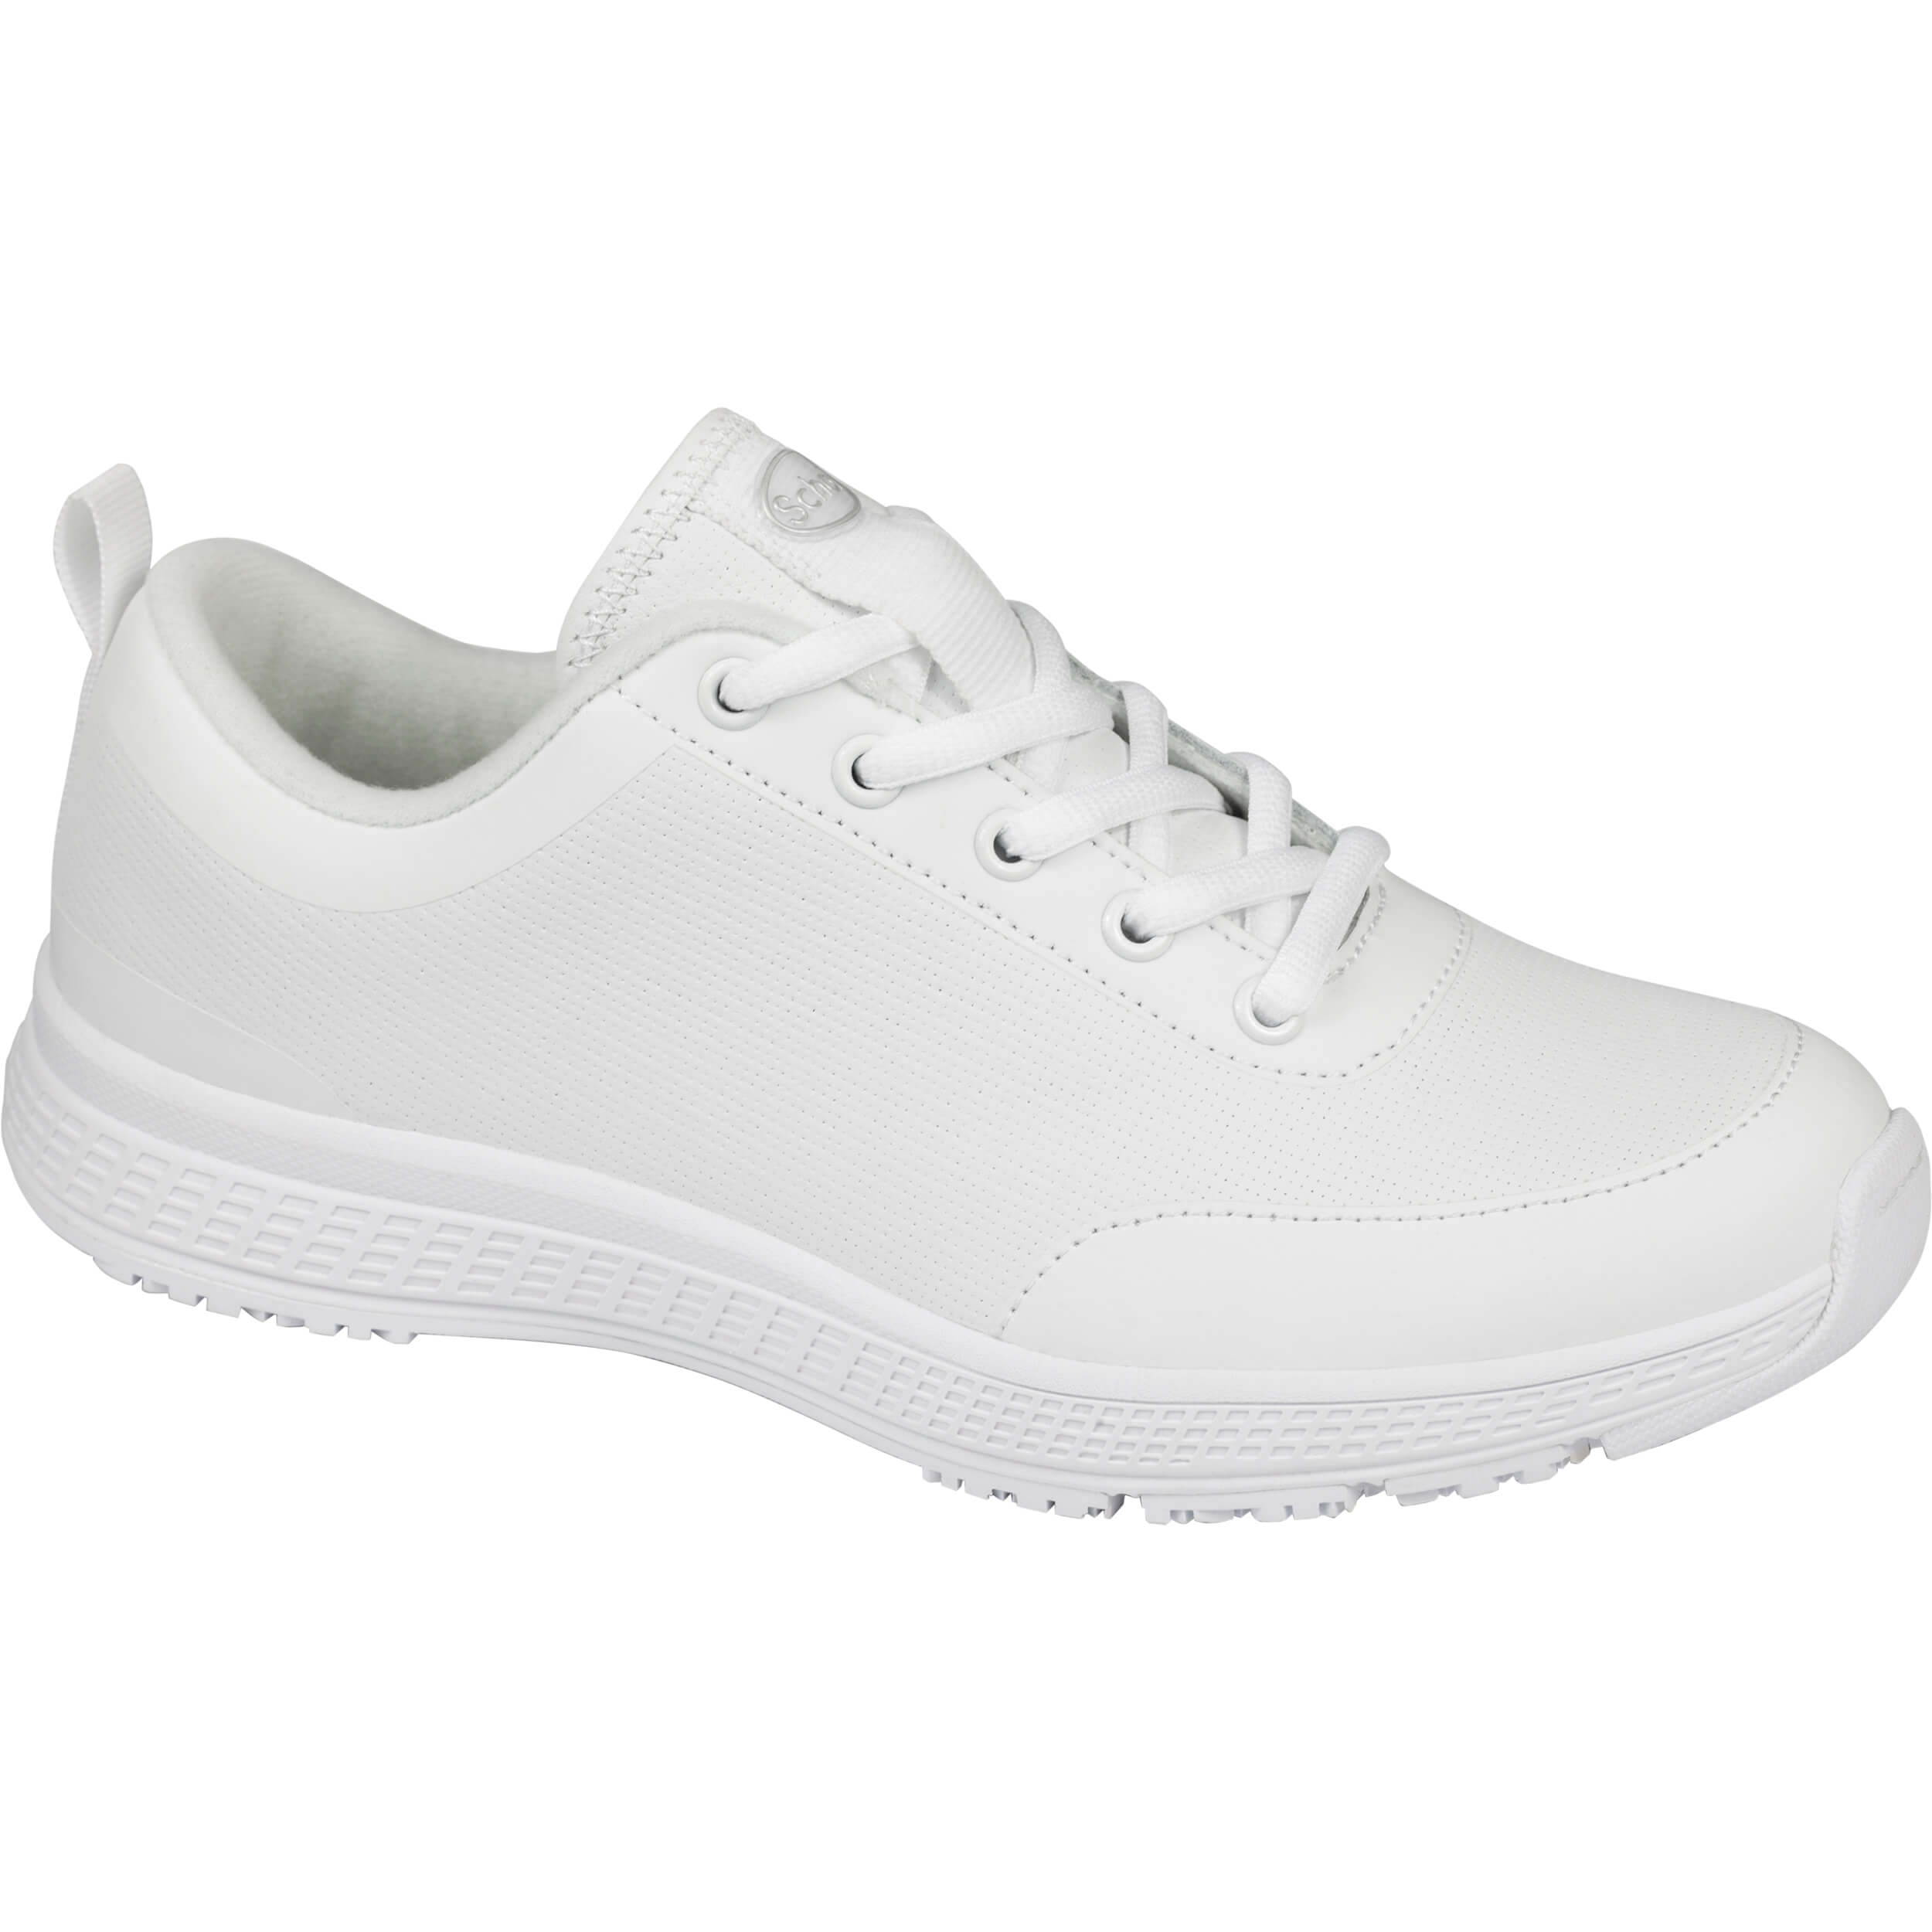 5f140cb87b8 Γυναικεία Ανατομικά Παπούτσια | Dr Scholl Shoes | Snif.gr